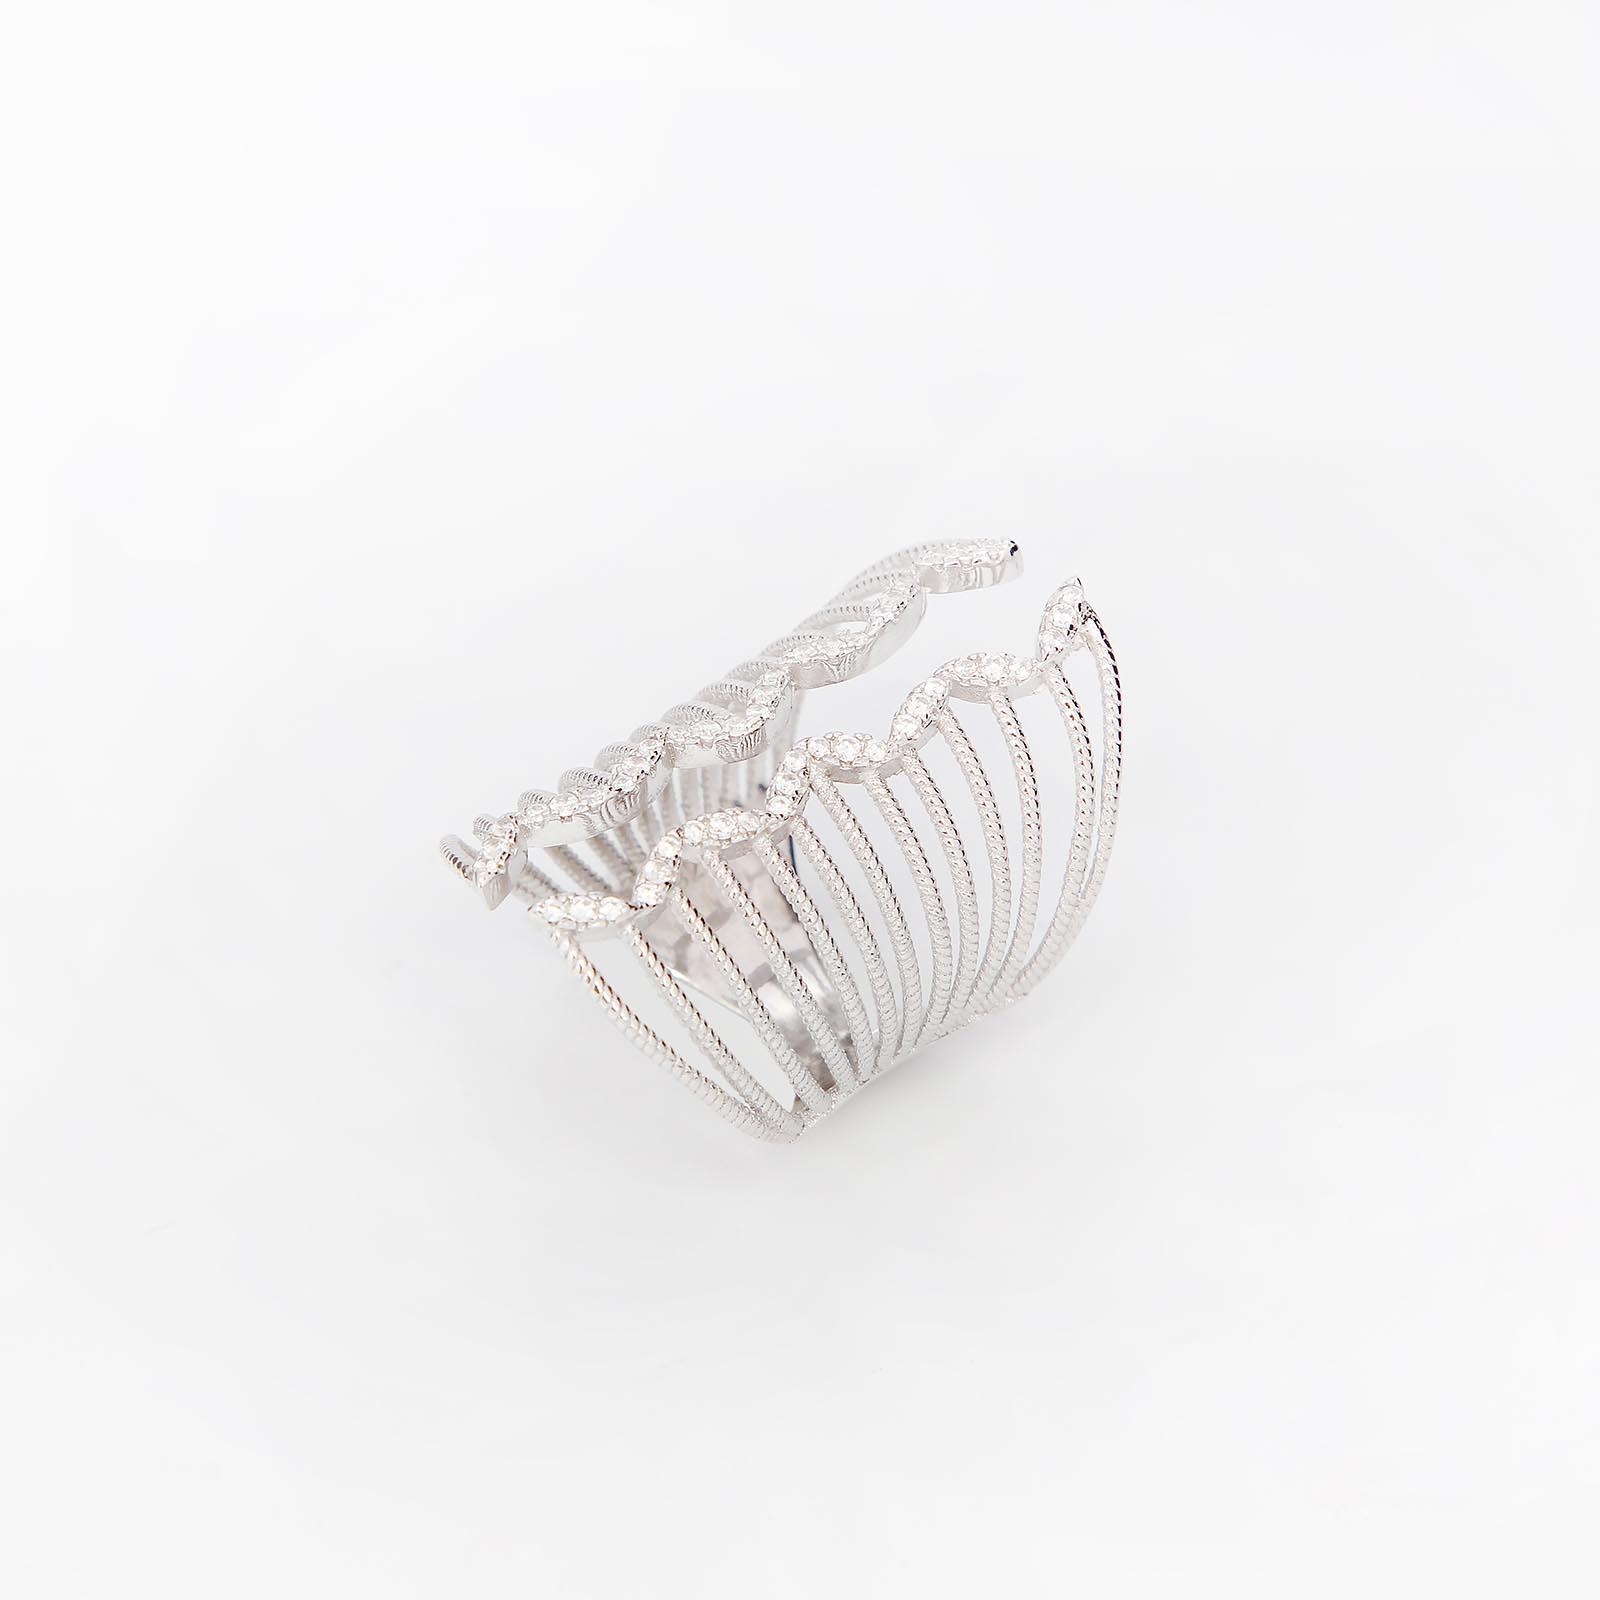 Серебряное кольцо «Квикстеп»